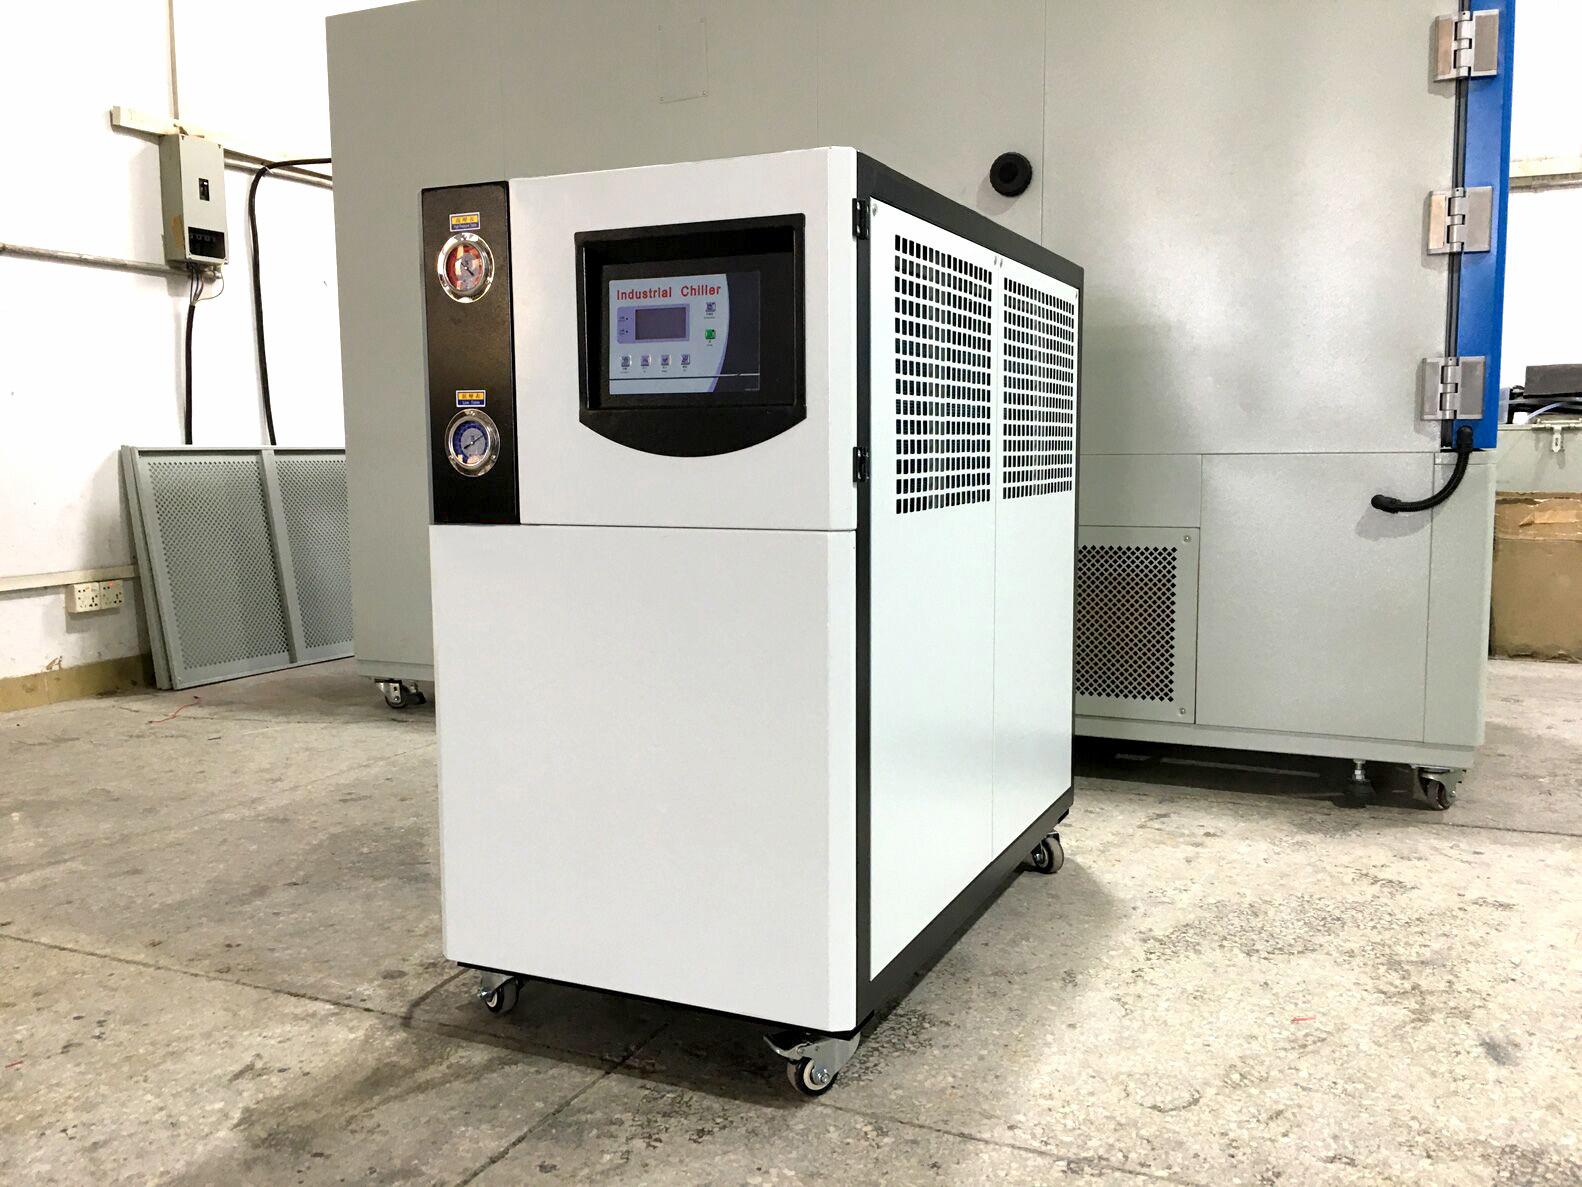 GW531B model industrial chiller